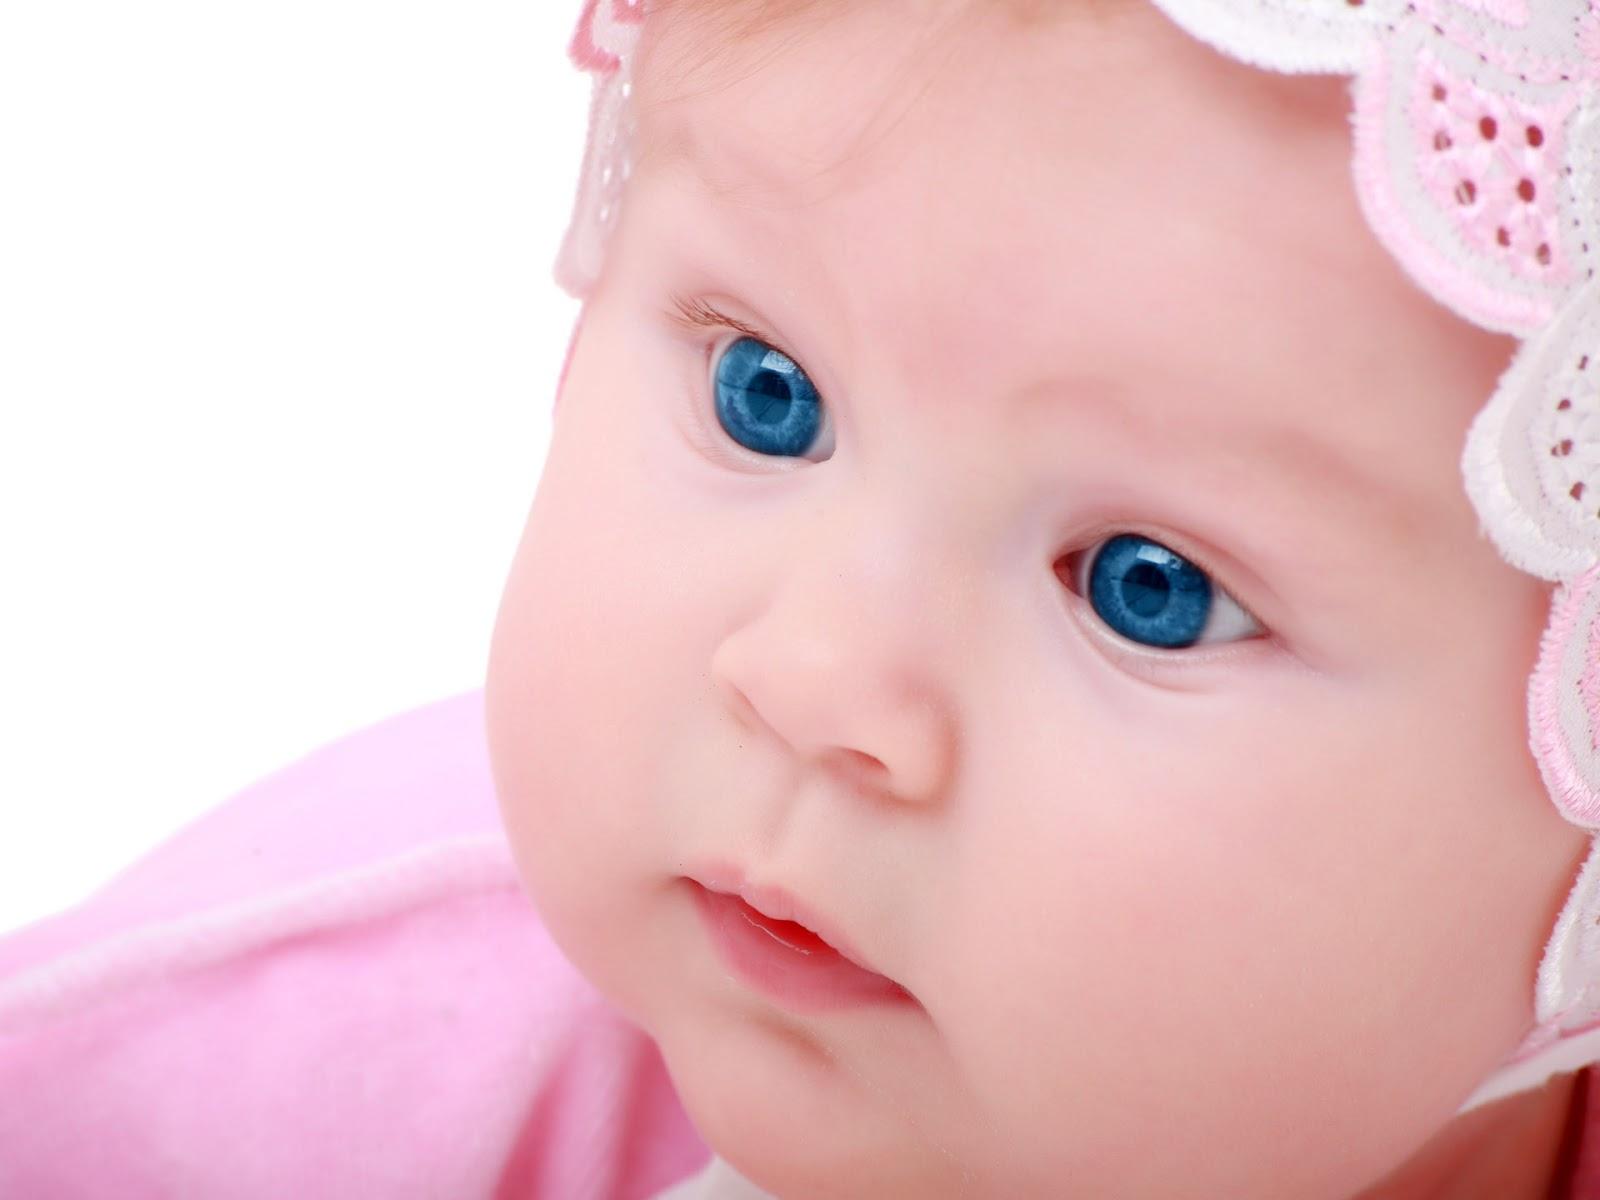 http://3.bp.blogspot.com/-jqTH7xavg1E/T3LI4BZgtpI/AAAAAAAAB5c/Gu3lXID5h0o/s1600/cute-baby-wallpaper_2.jpg